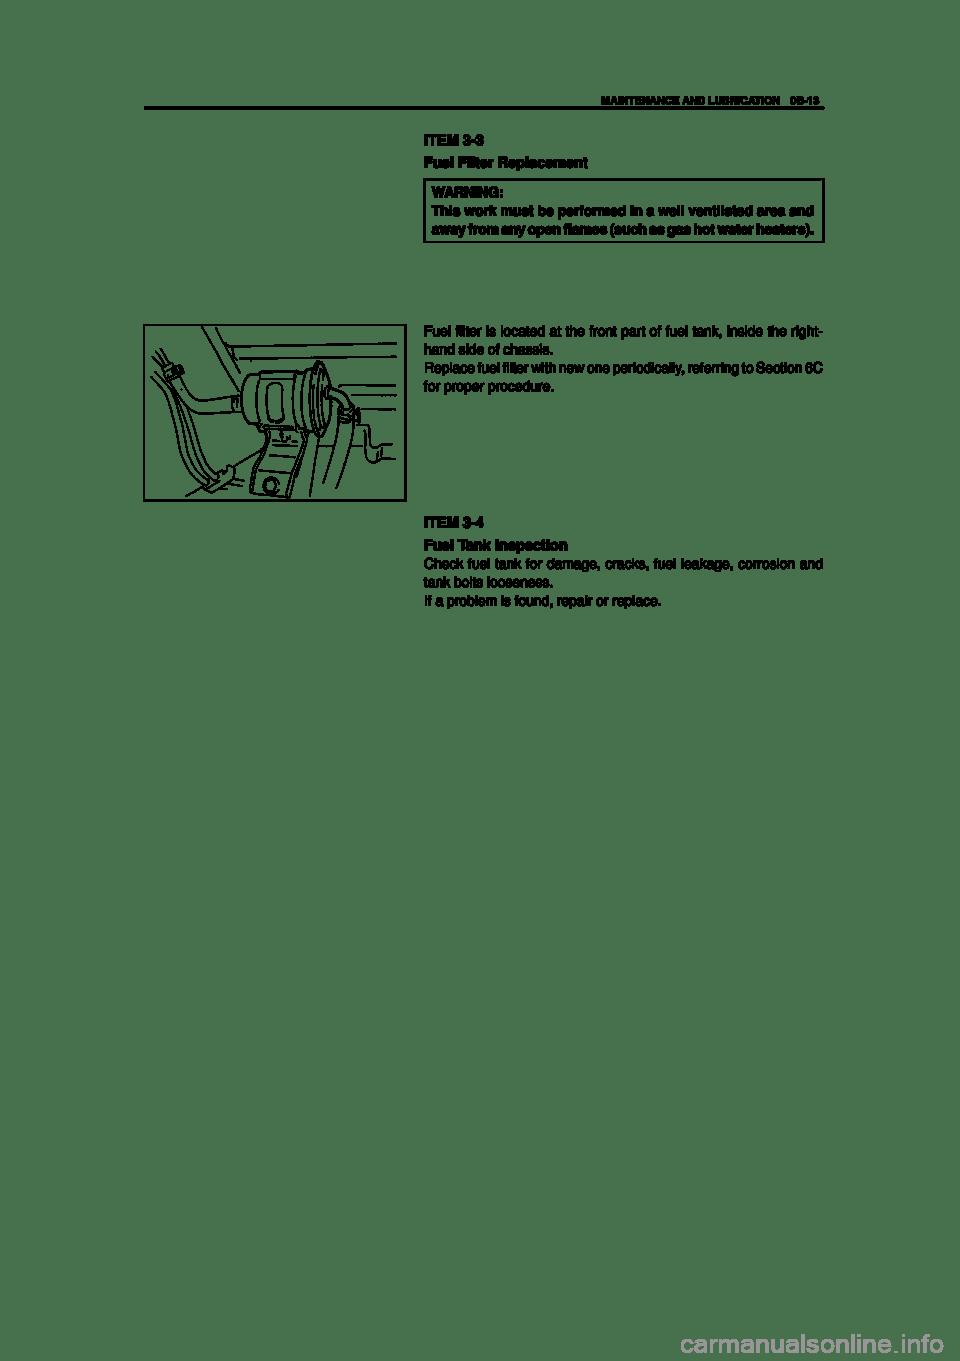 hight resolution of suzuki grand vitara 2002 2 g service workshop manual page 40